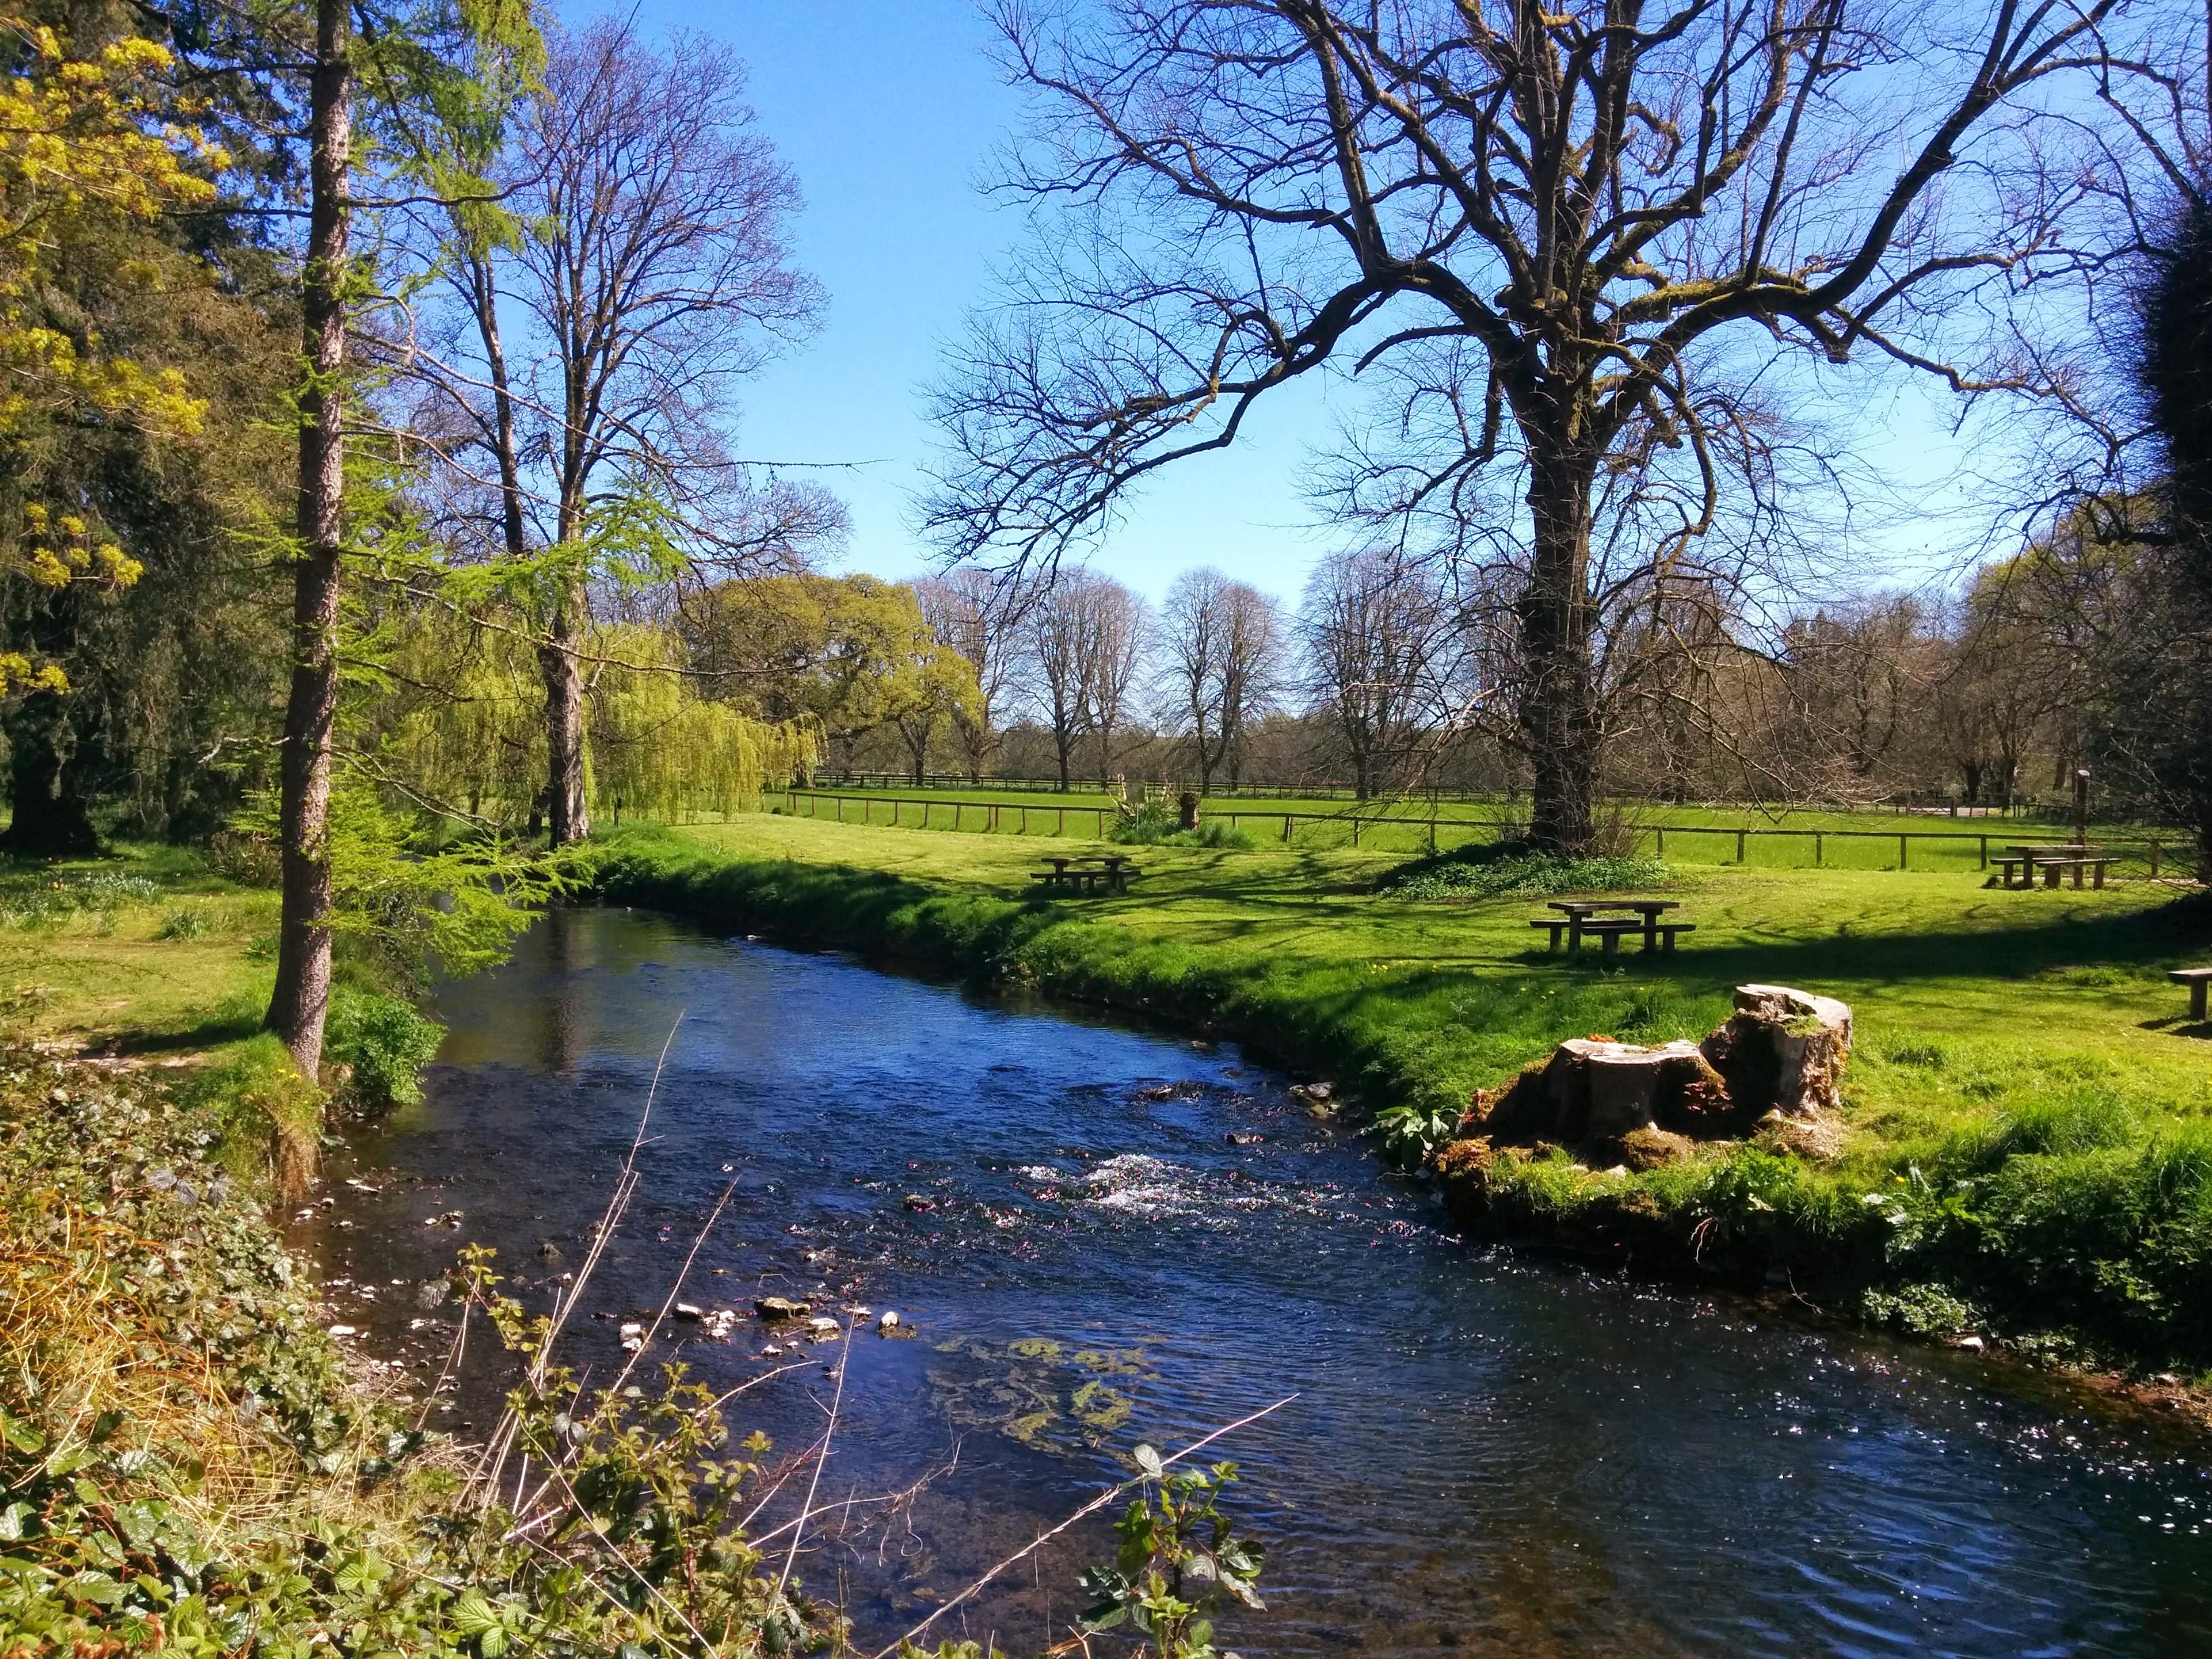 River at the Blarney Castle Estate